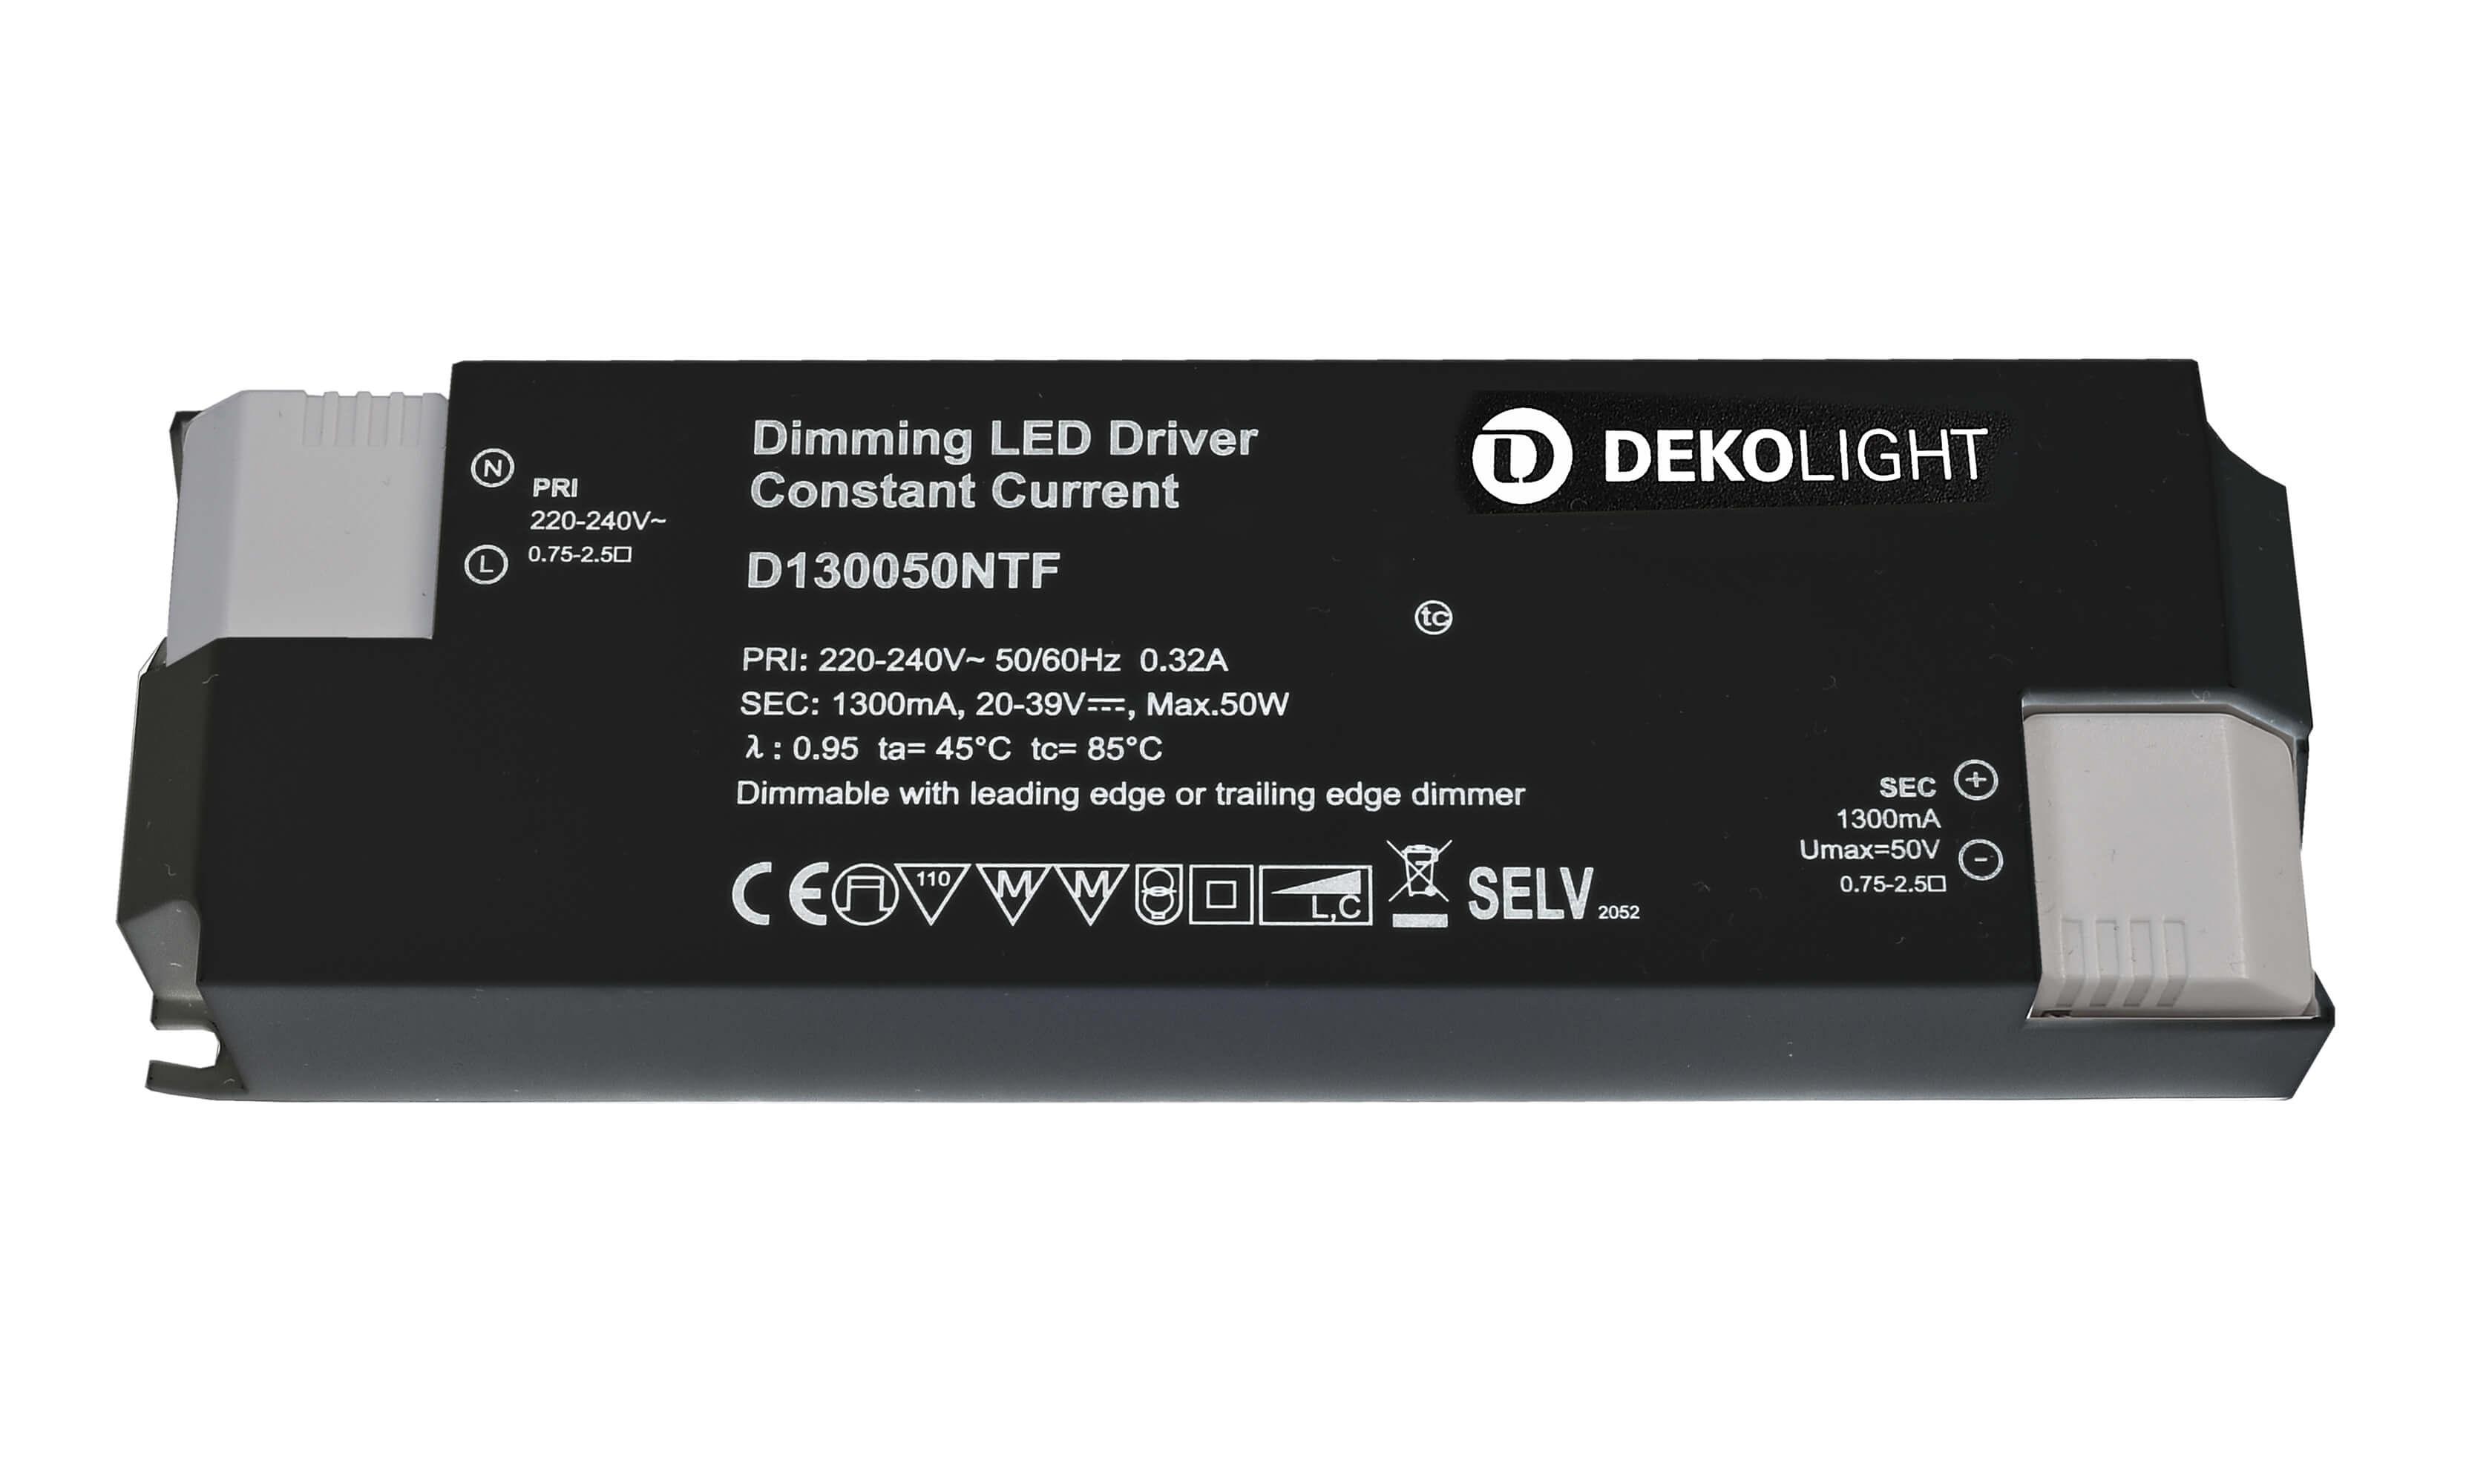 BASIC, DIM, CC, D130050NTF/50W